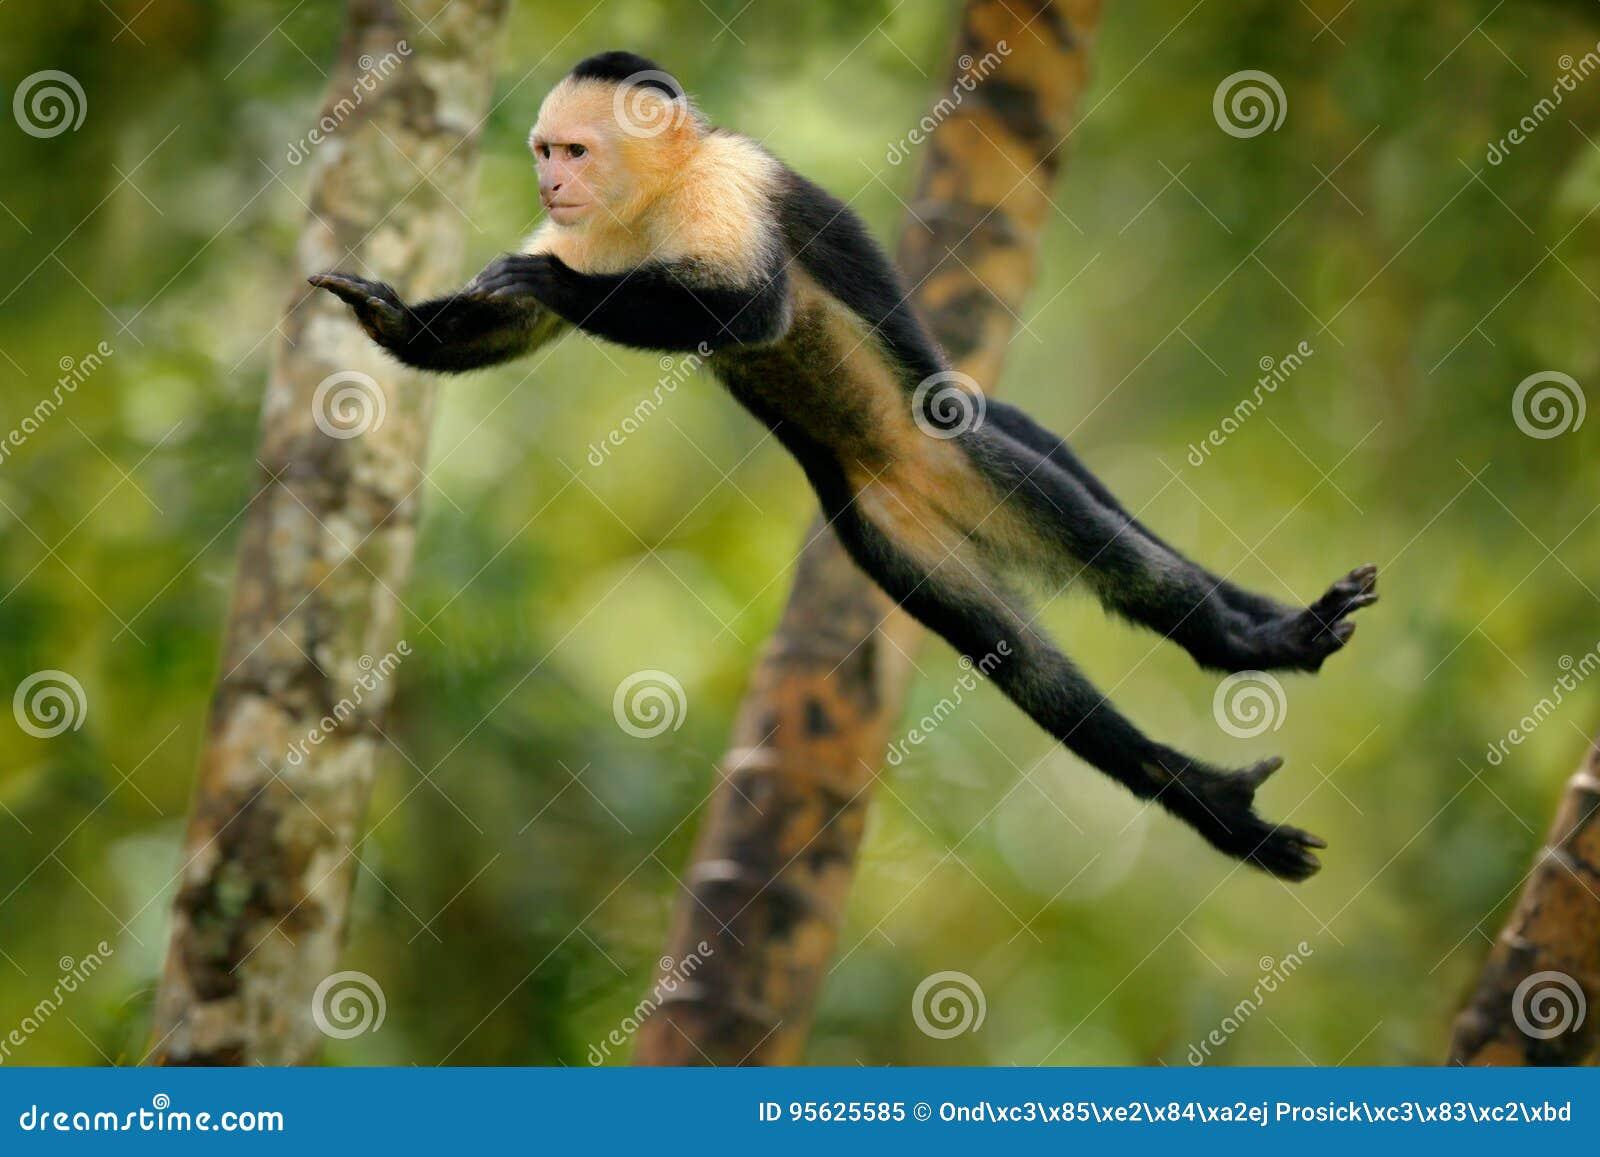 Monkey jump. Mammal in fly. Flying black monkey White-headed Capuchin, tropic forest. Animal in the nature habitat, humorous behav